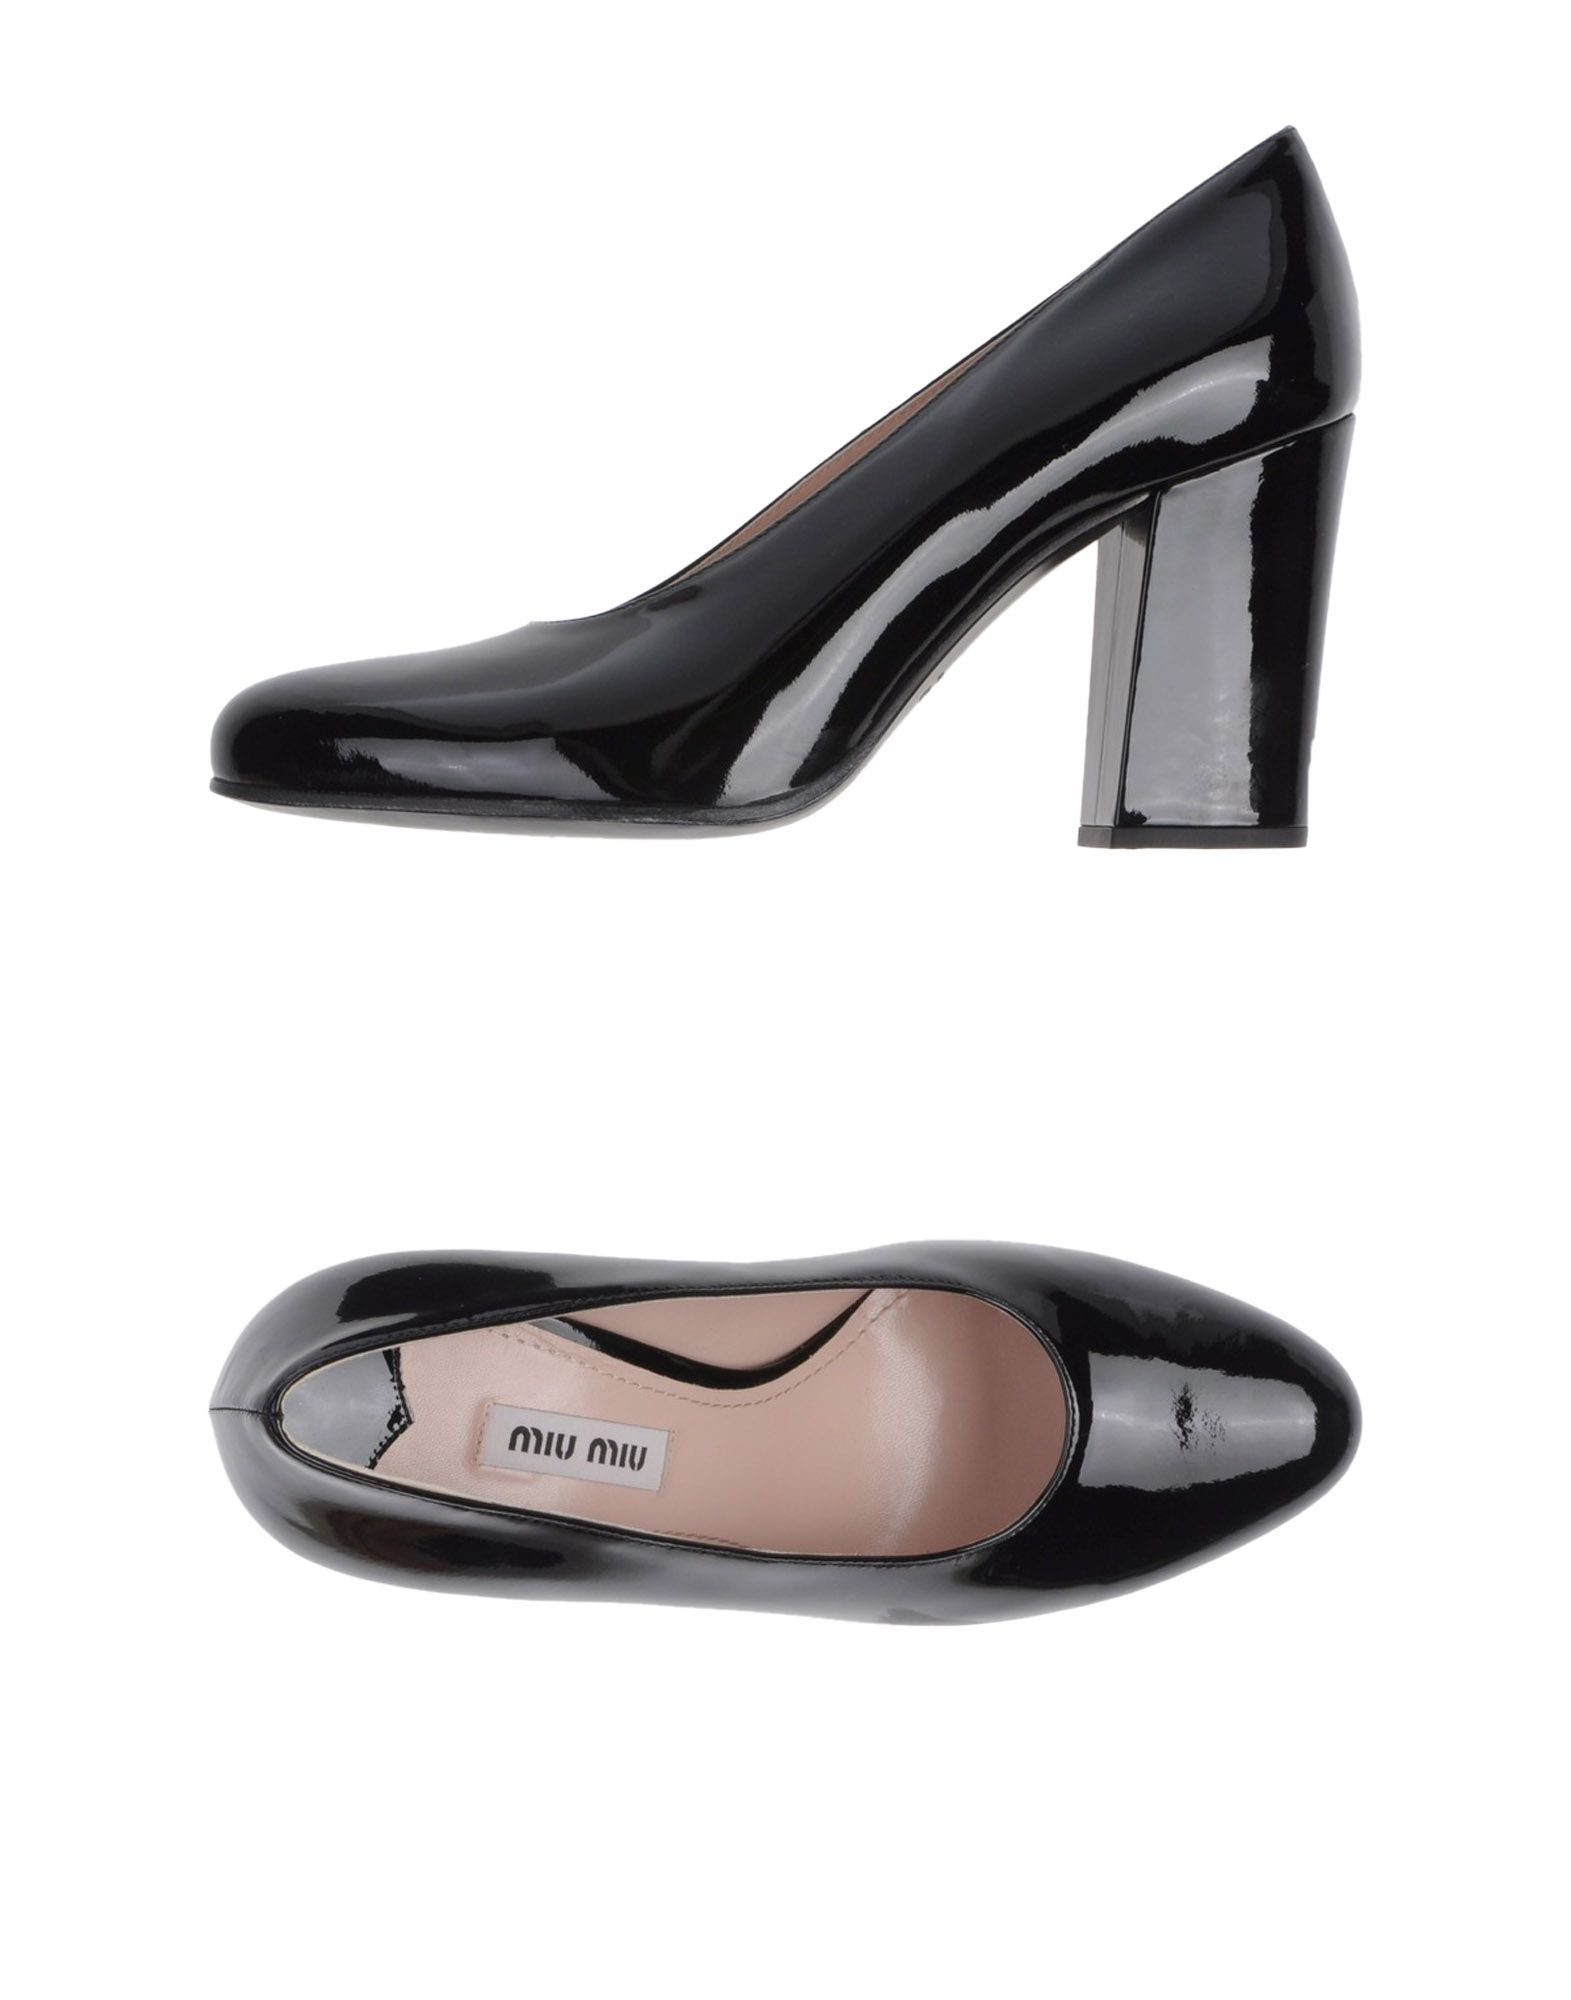 Escarpins Miu Miu Femme - Escarpins Miu Miu Noir Dernières chaussures discount pour hommes et femmes